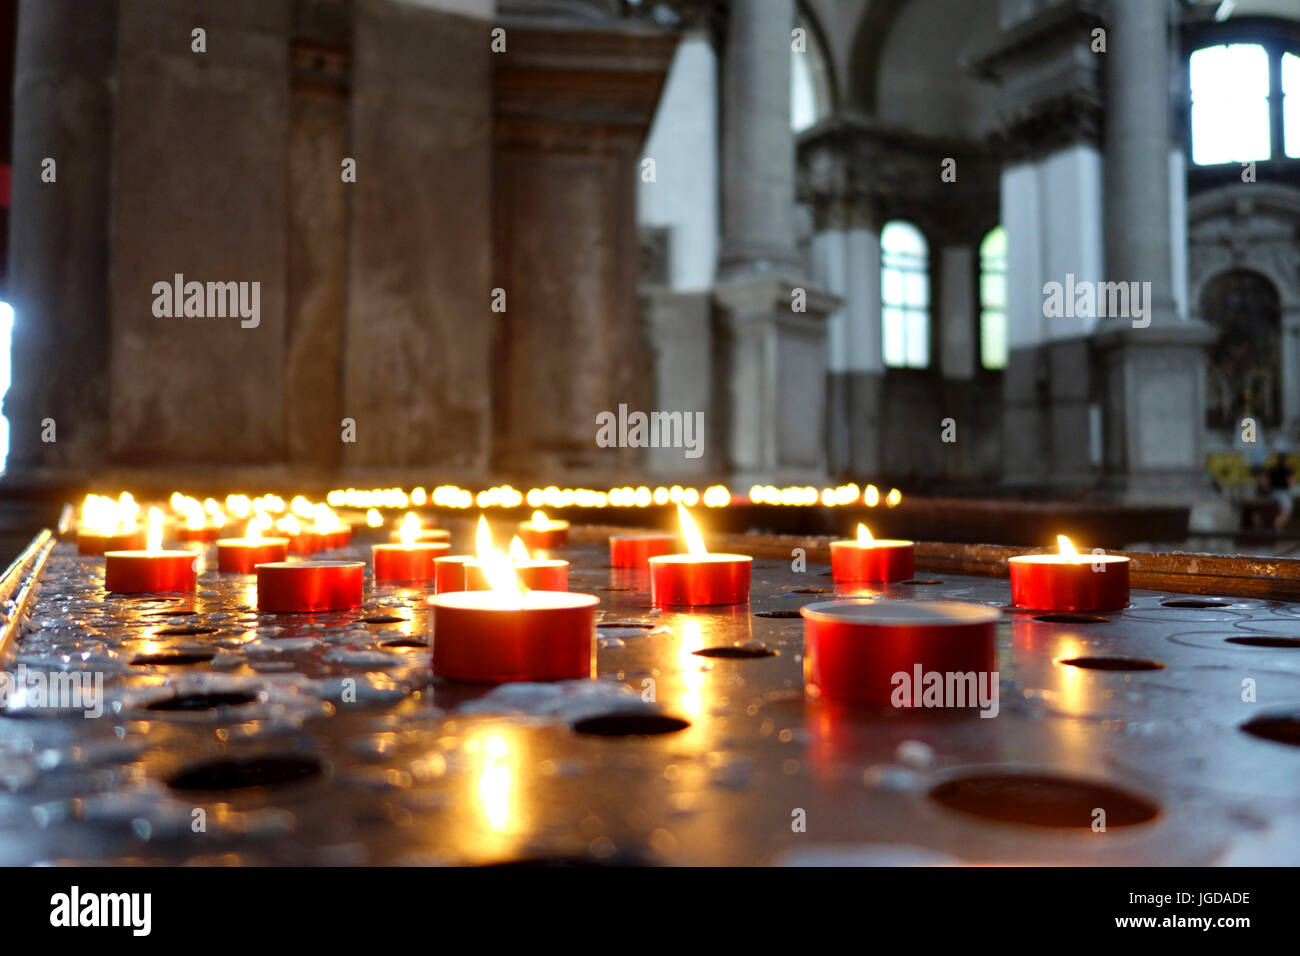 Lit prayer candles in a Catholic church, Venice, Italy Stock Photo